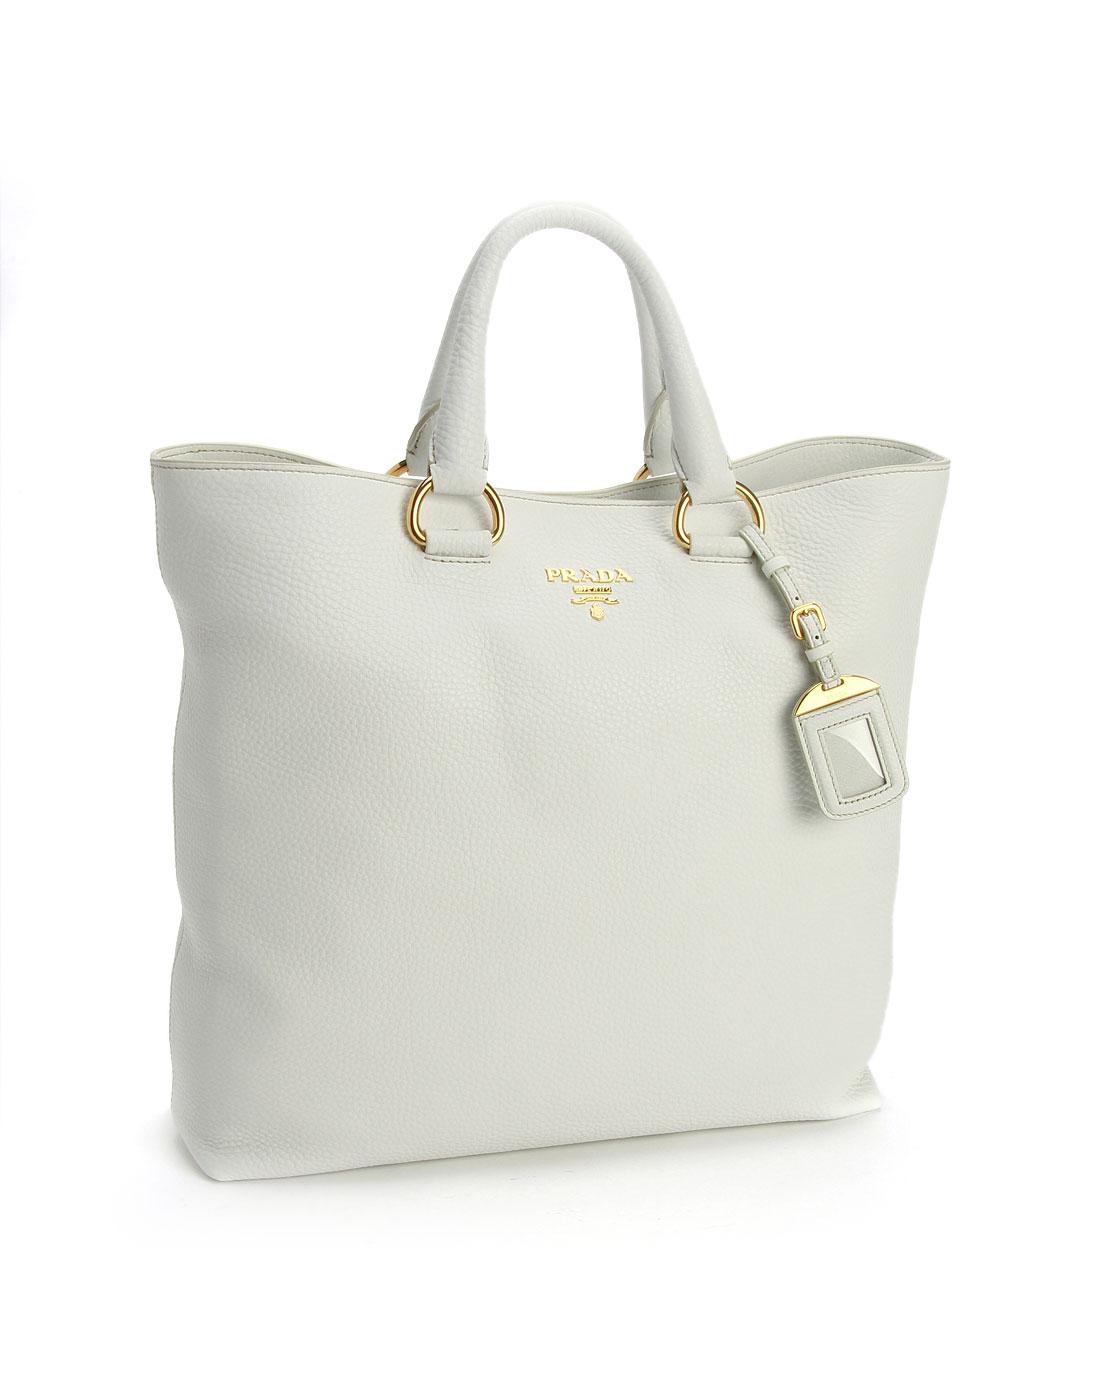 prada女款白色压纹时尚手提包bn1713bianco